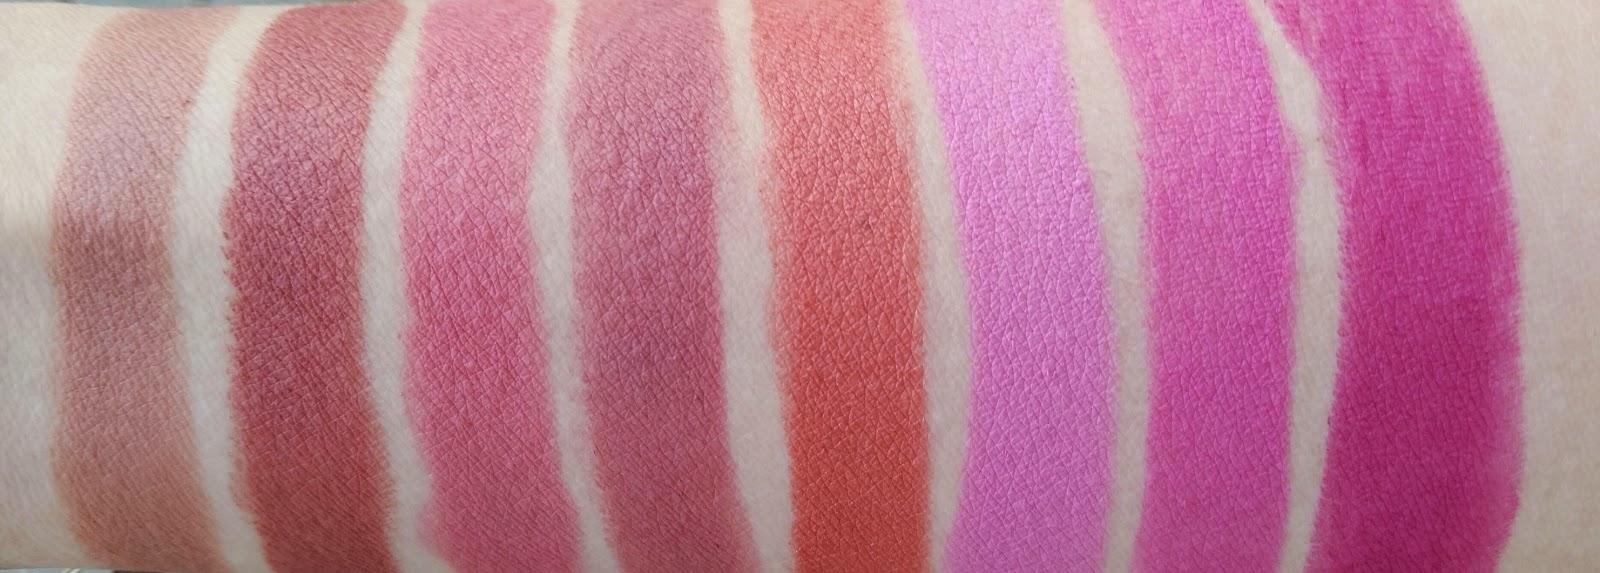 jordana modern matte lipstick swatches